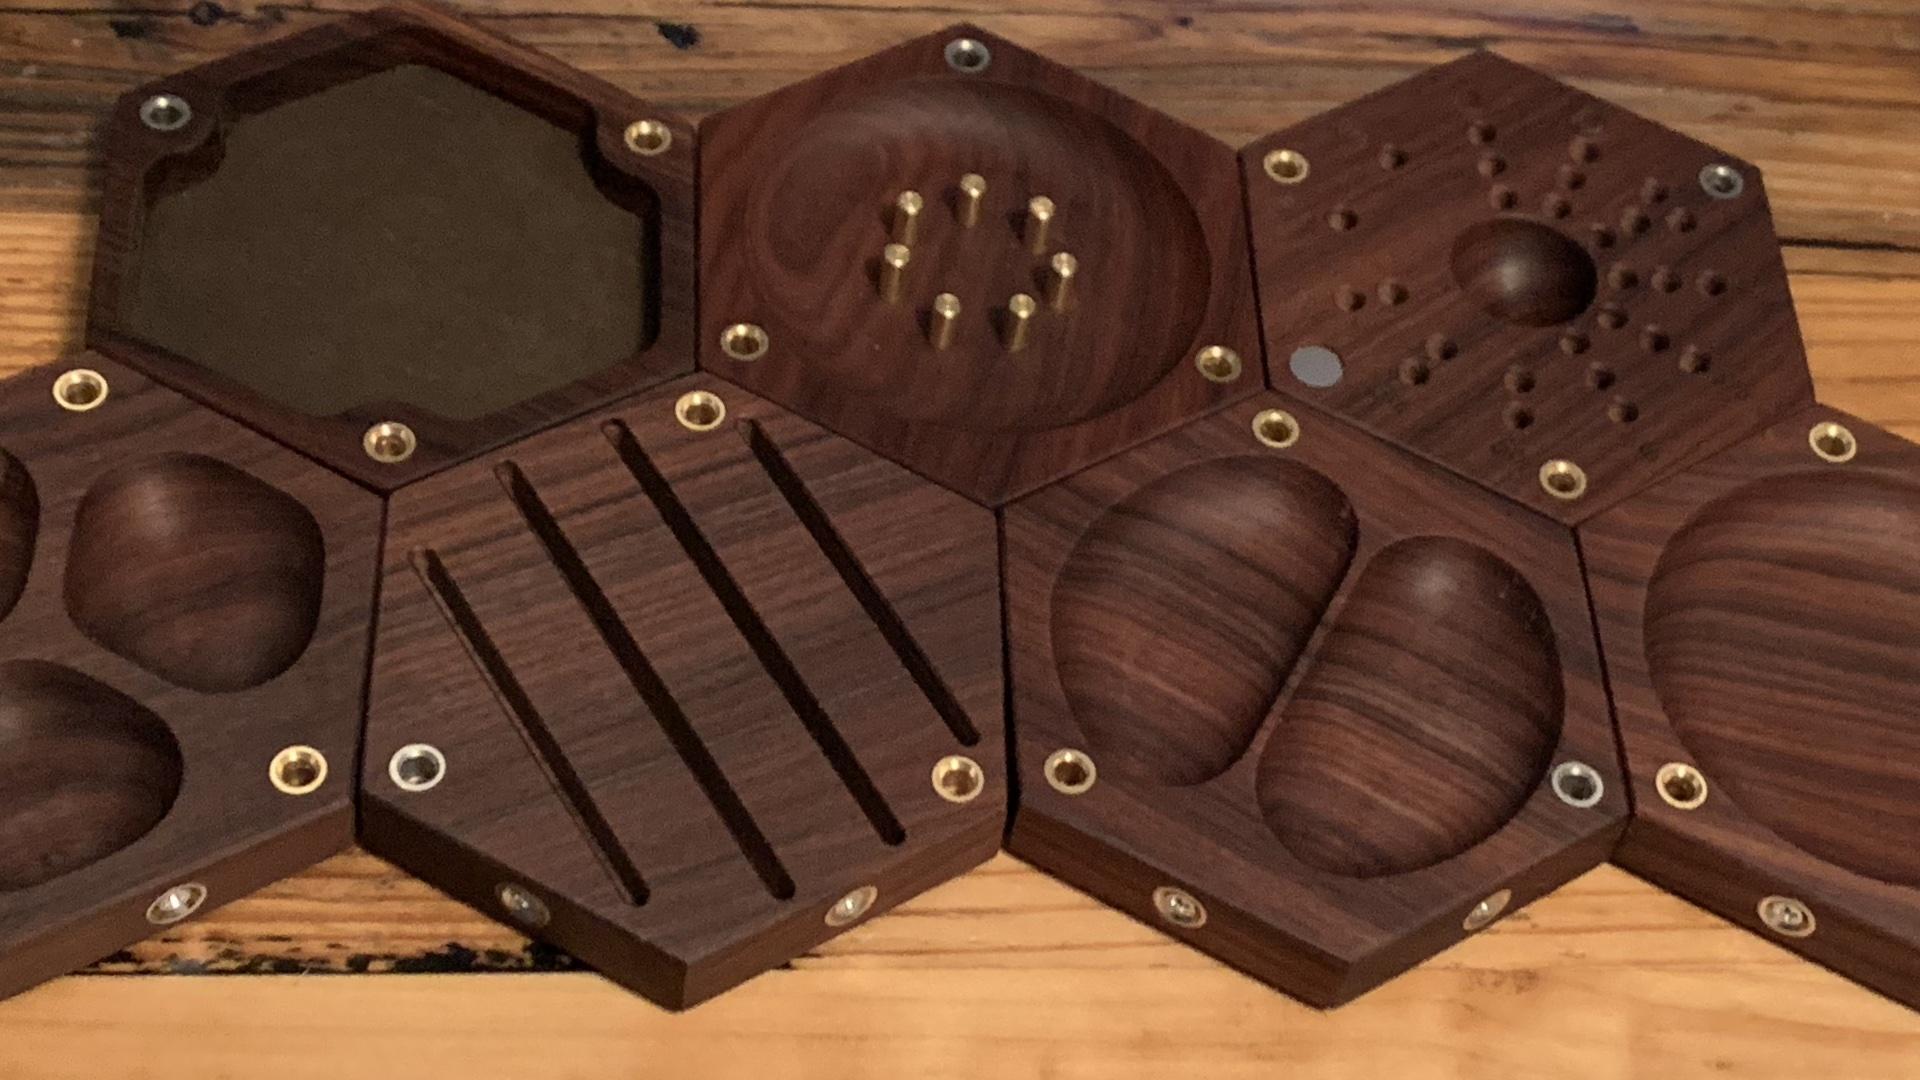 Wyrmwood Gaming Brings Tabletop Tiles to Kickstarter to Fix